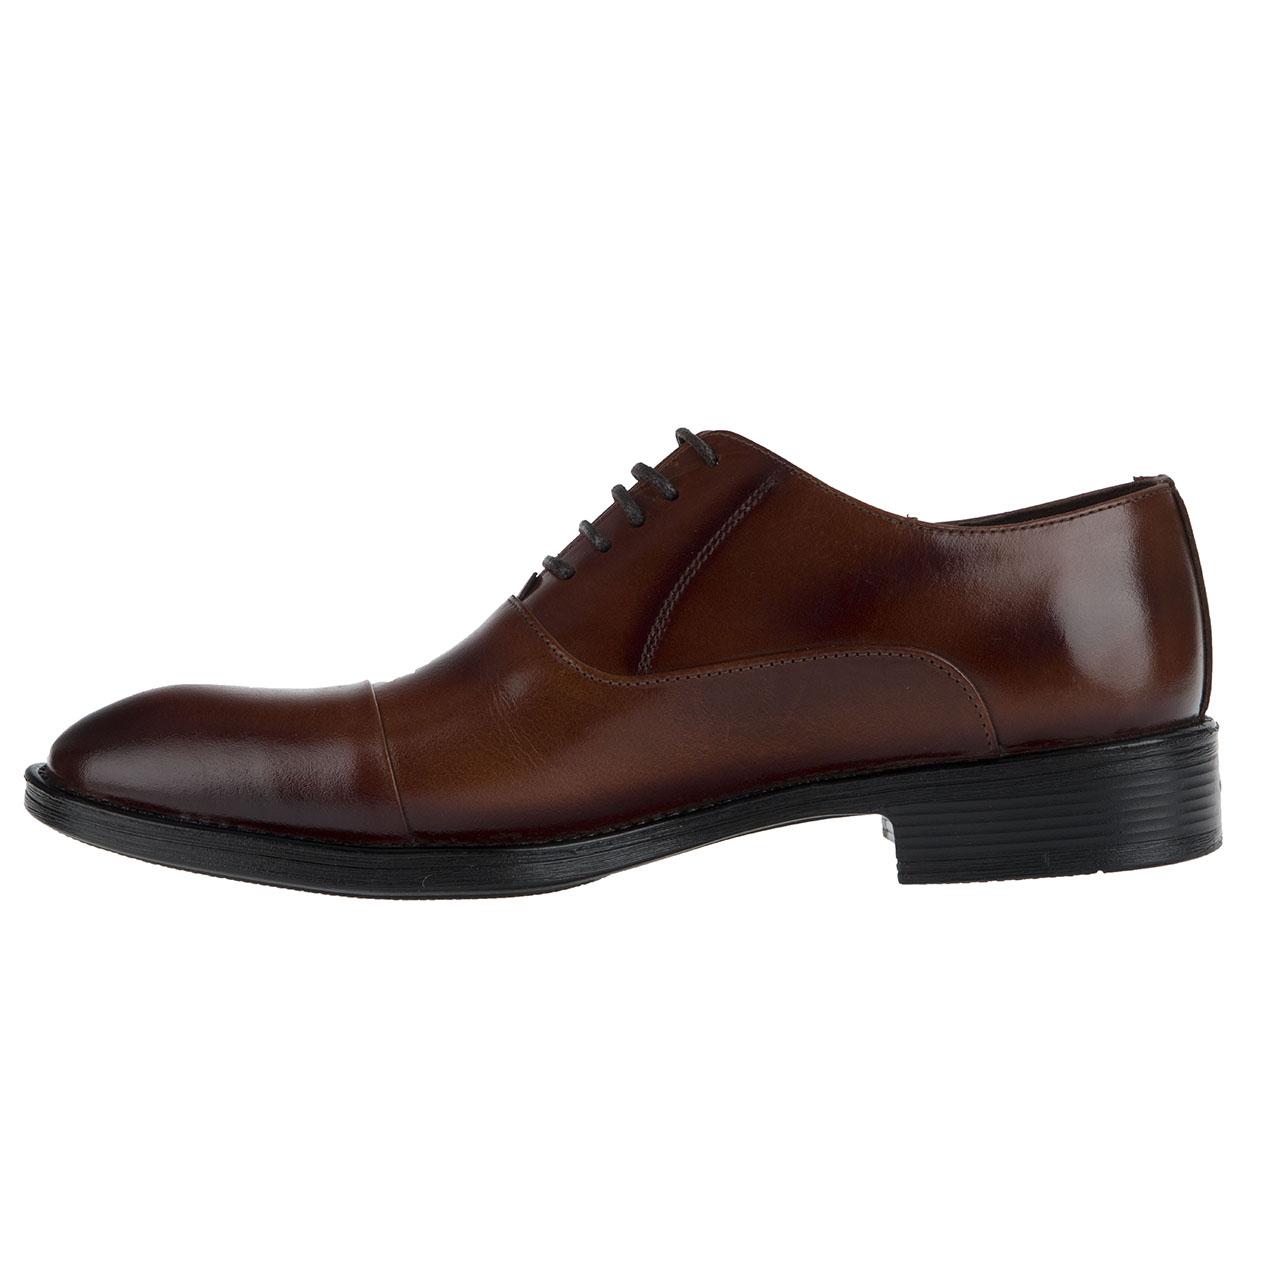 کفش مردانه چرم مکس مدل LORD رنگ قهوه ای